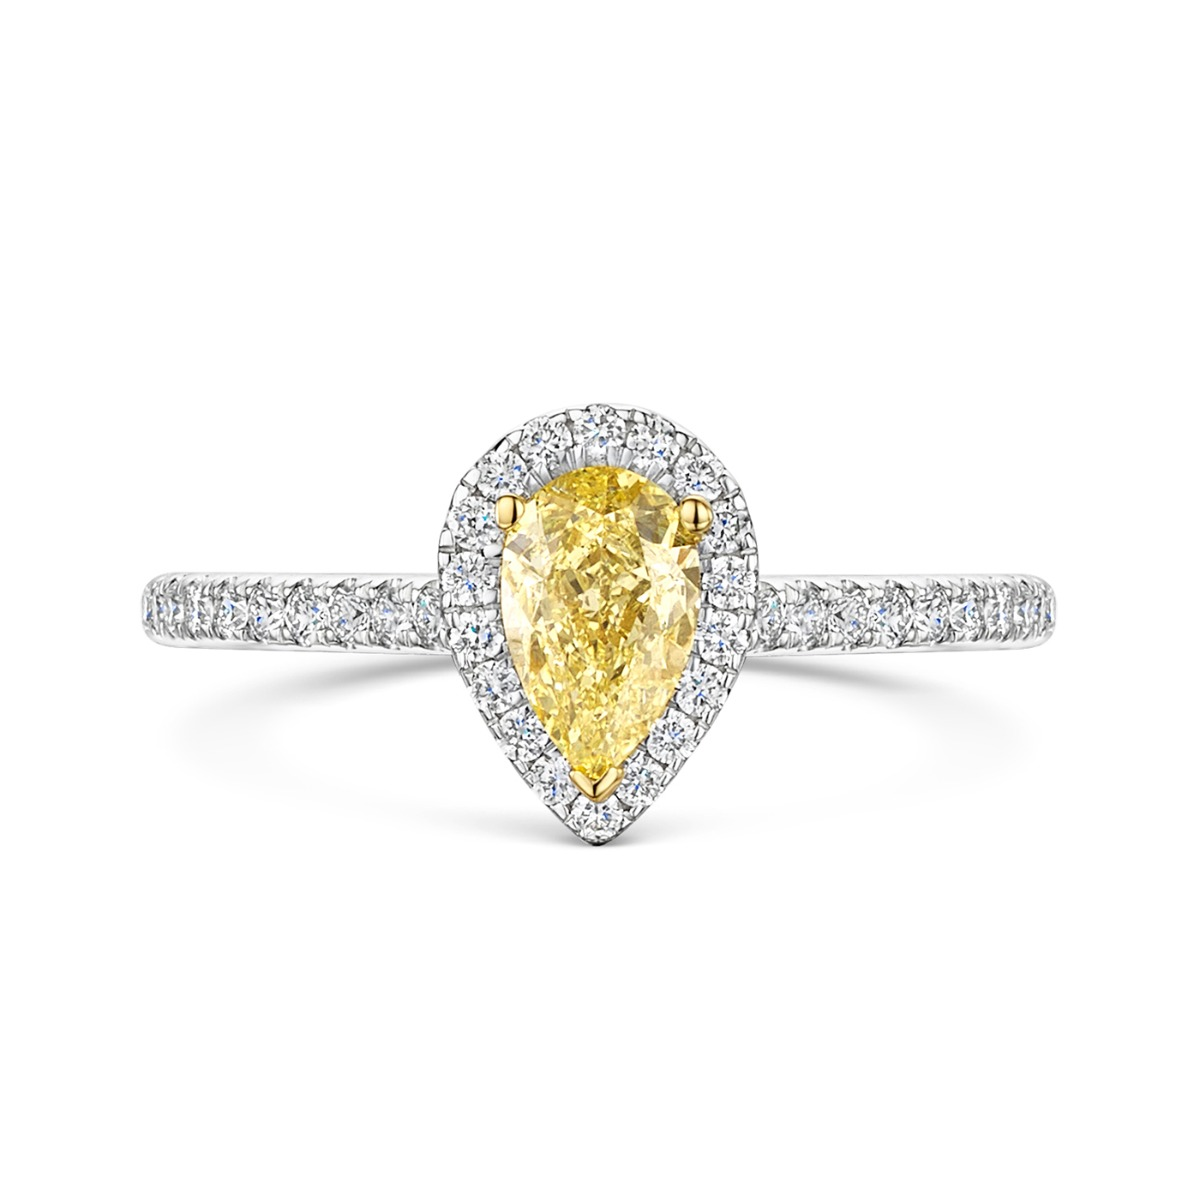 ROX Love Pear Cut Yellow Diamond Halo Ring in Platinum